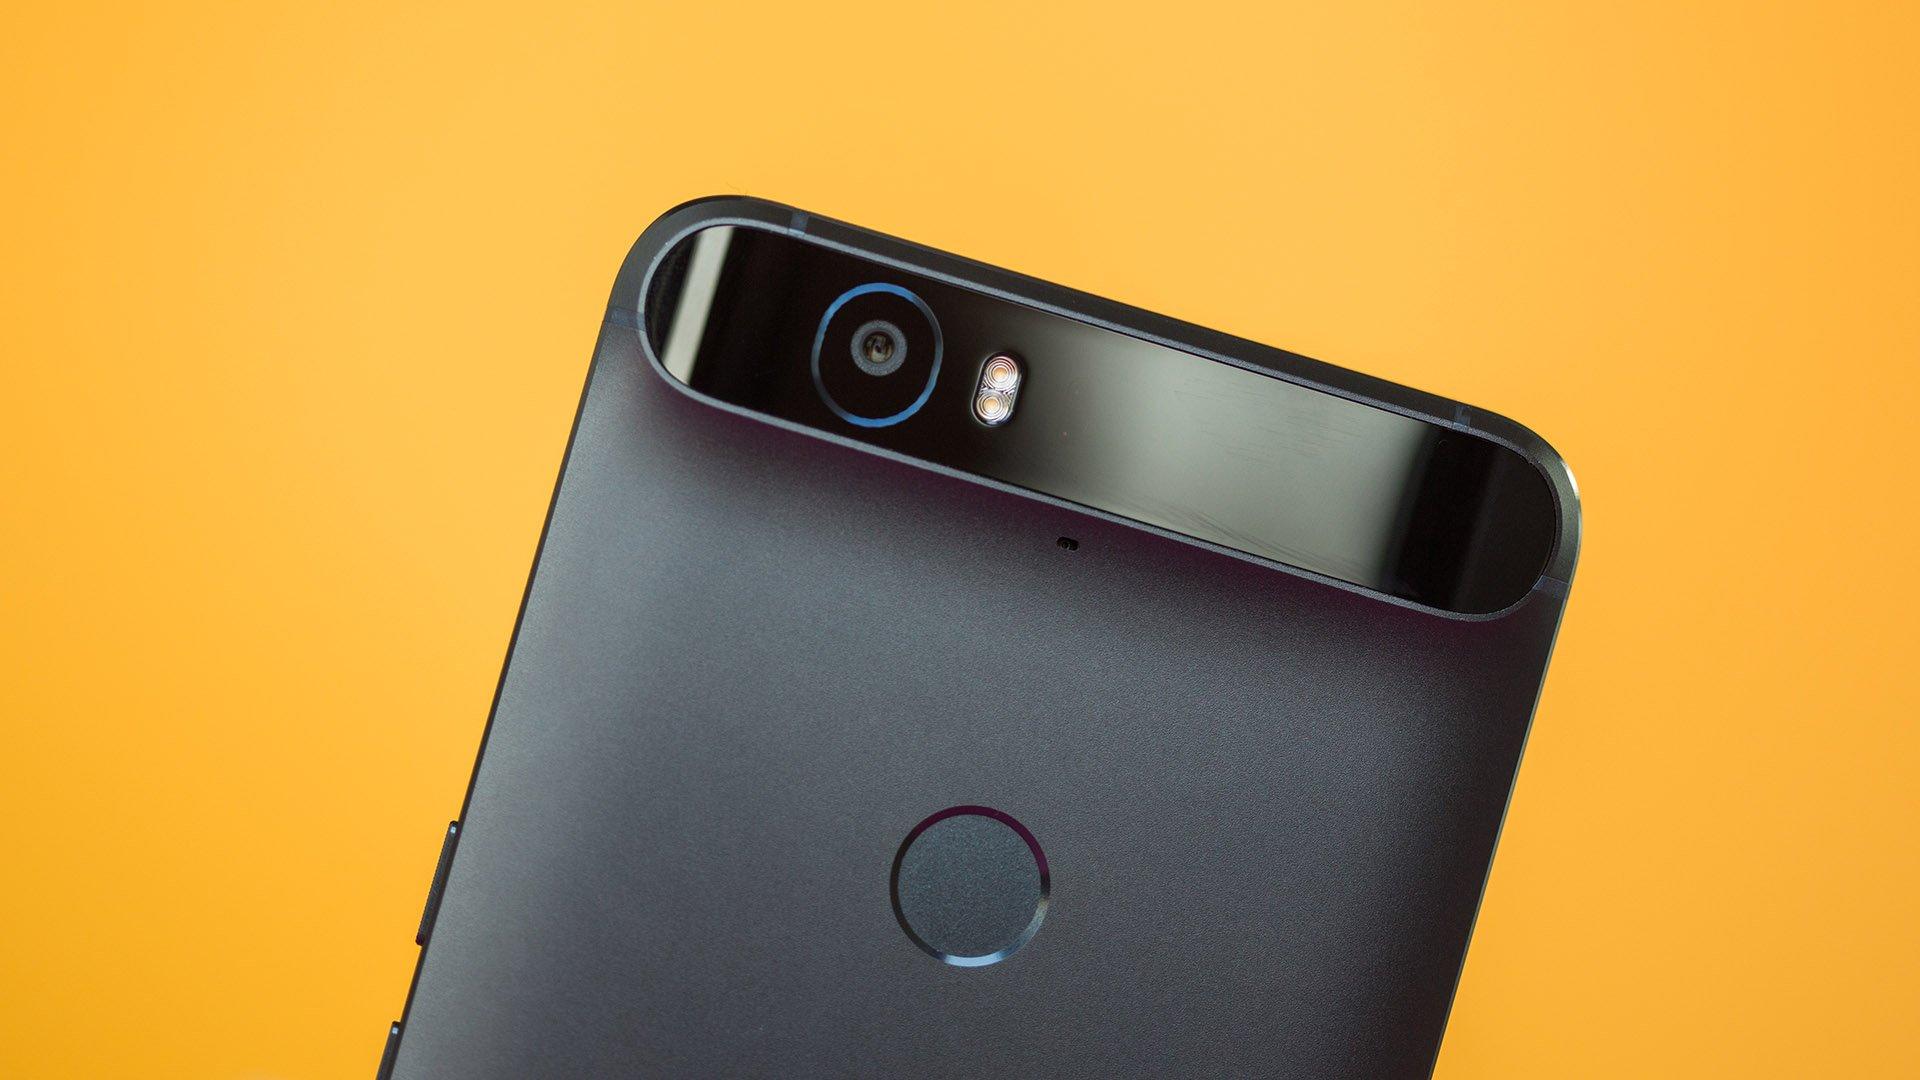 Nexus 6P Bootloop problems trigger class action complaint   AndroidPIT